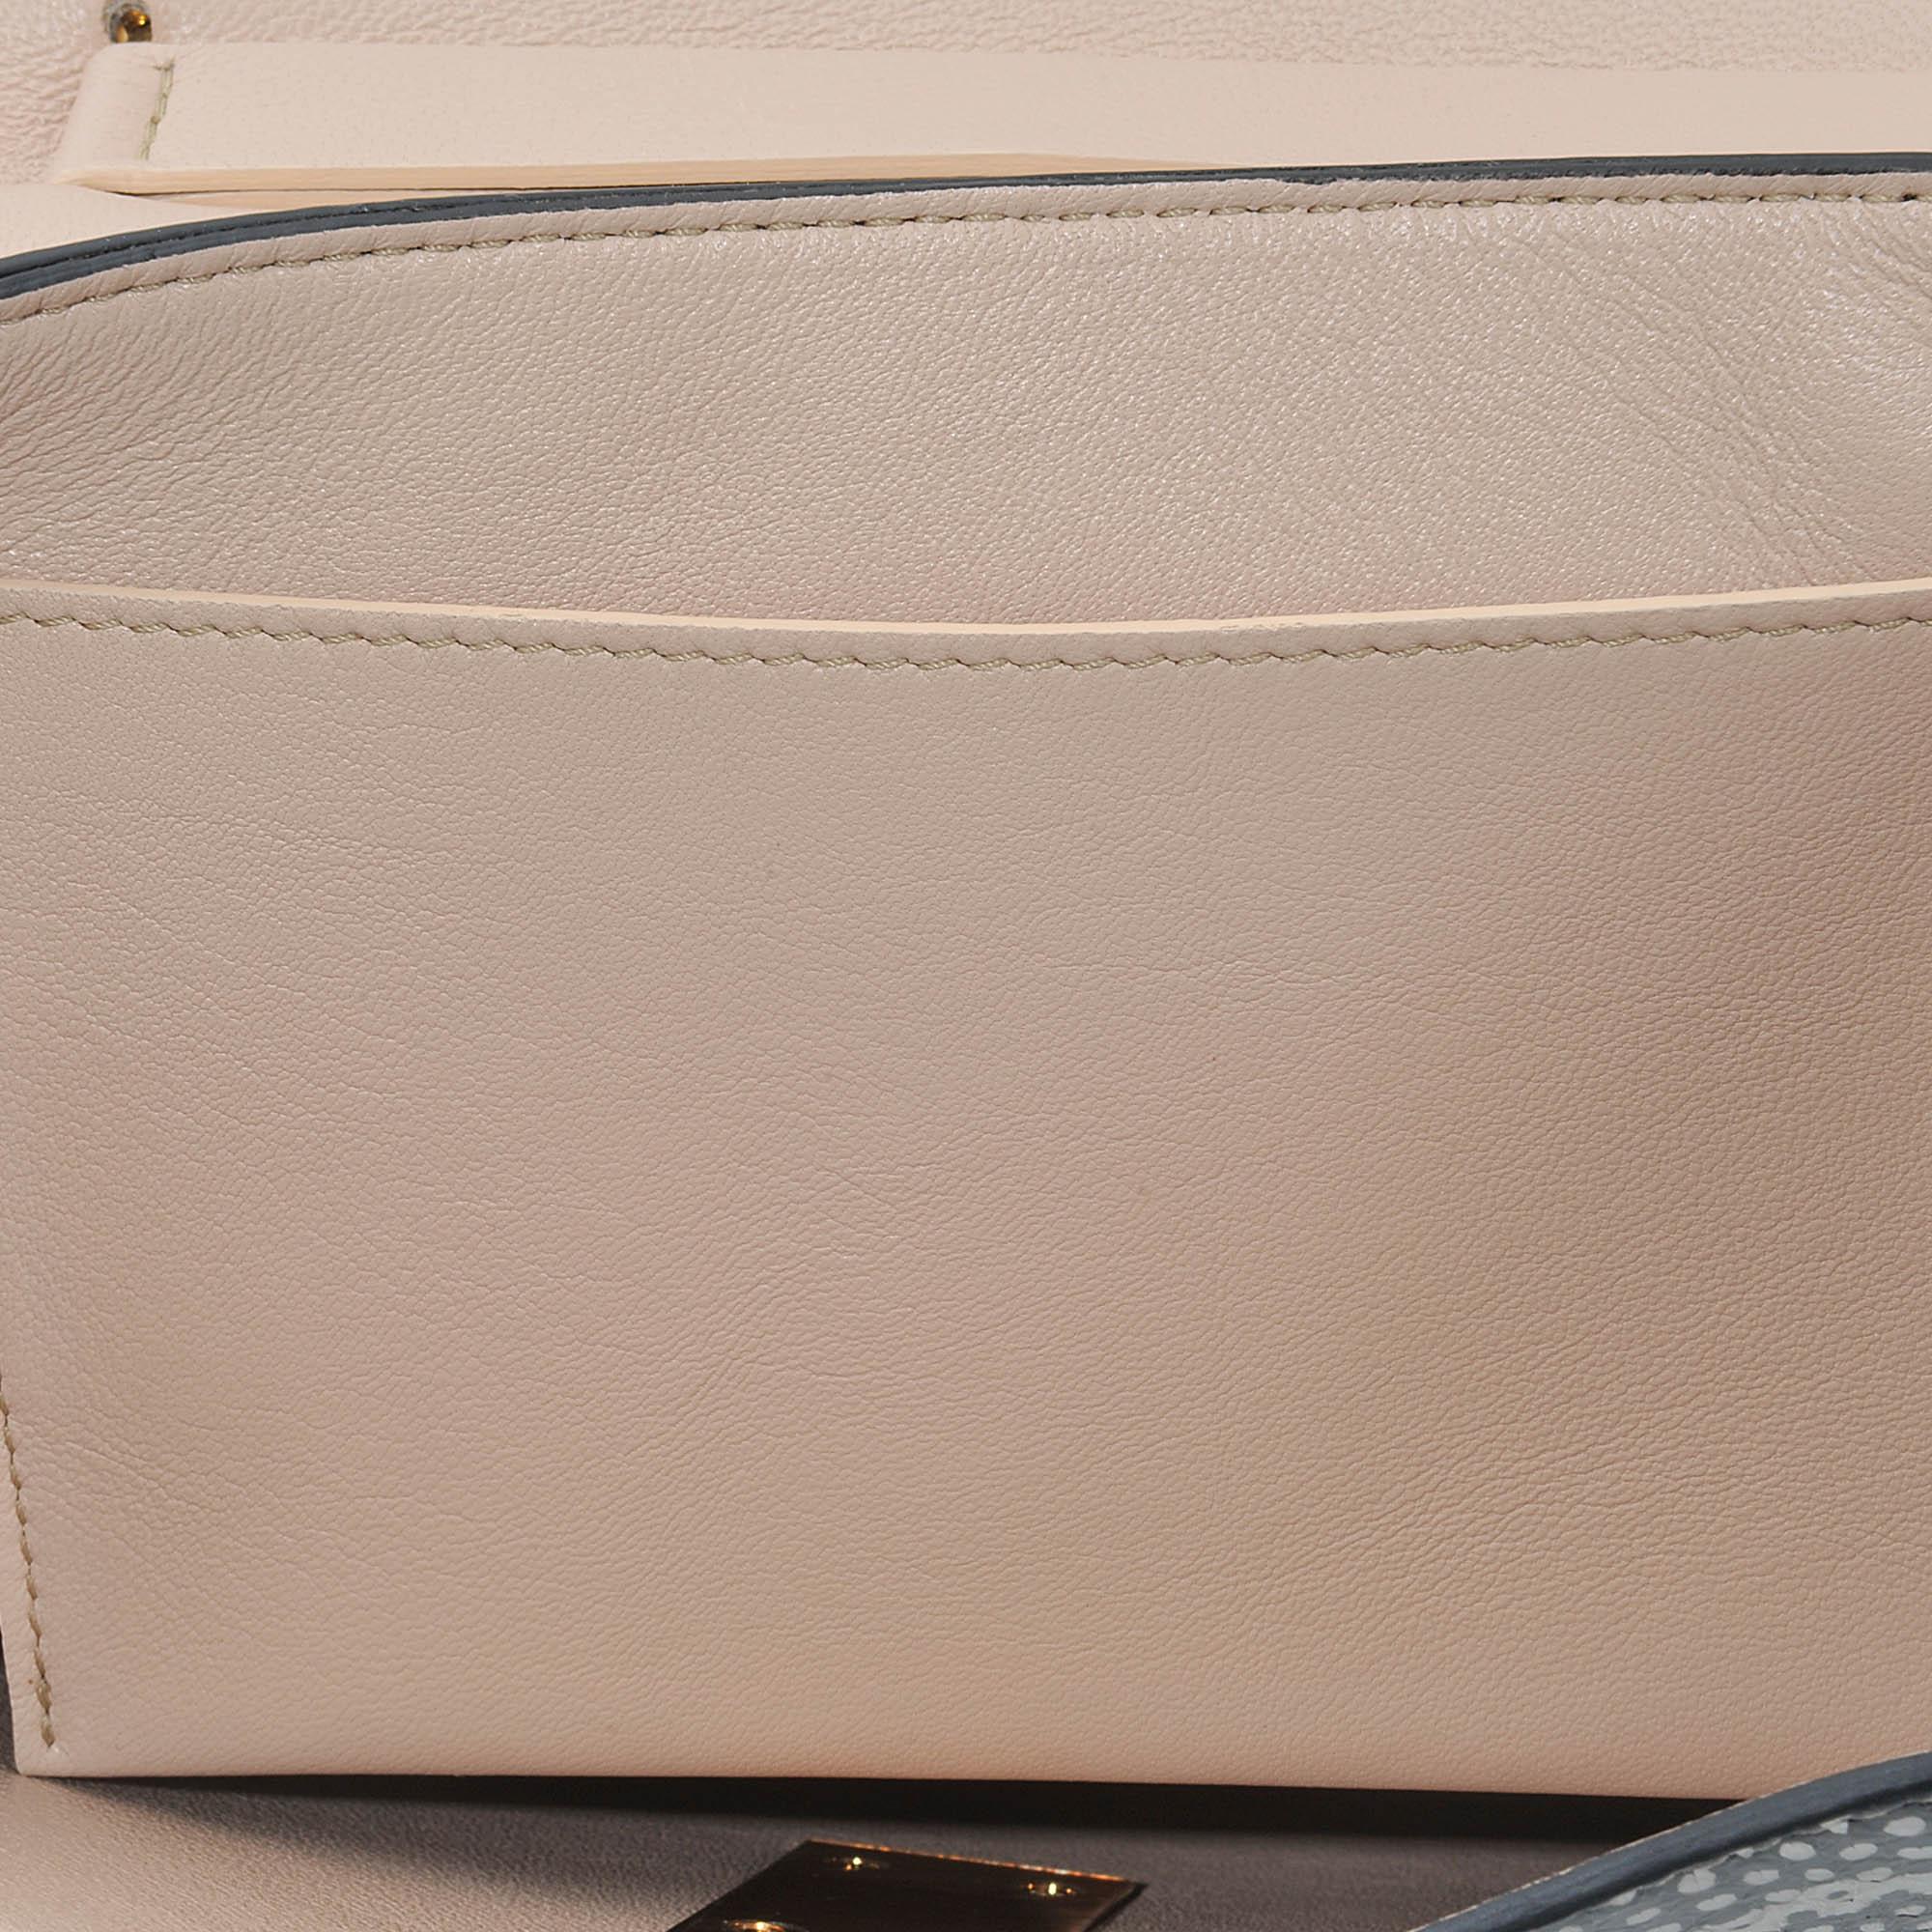 birkin handbag price - chloe drew small chain watersnake bag, white chloe bag